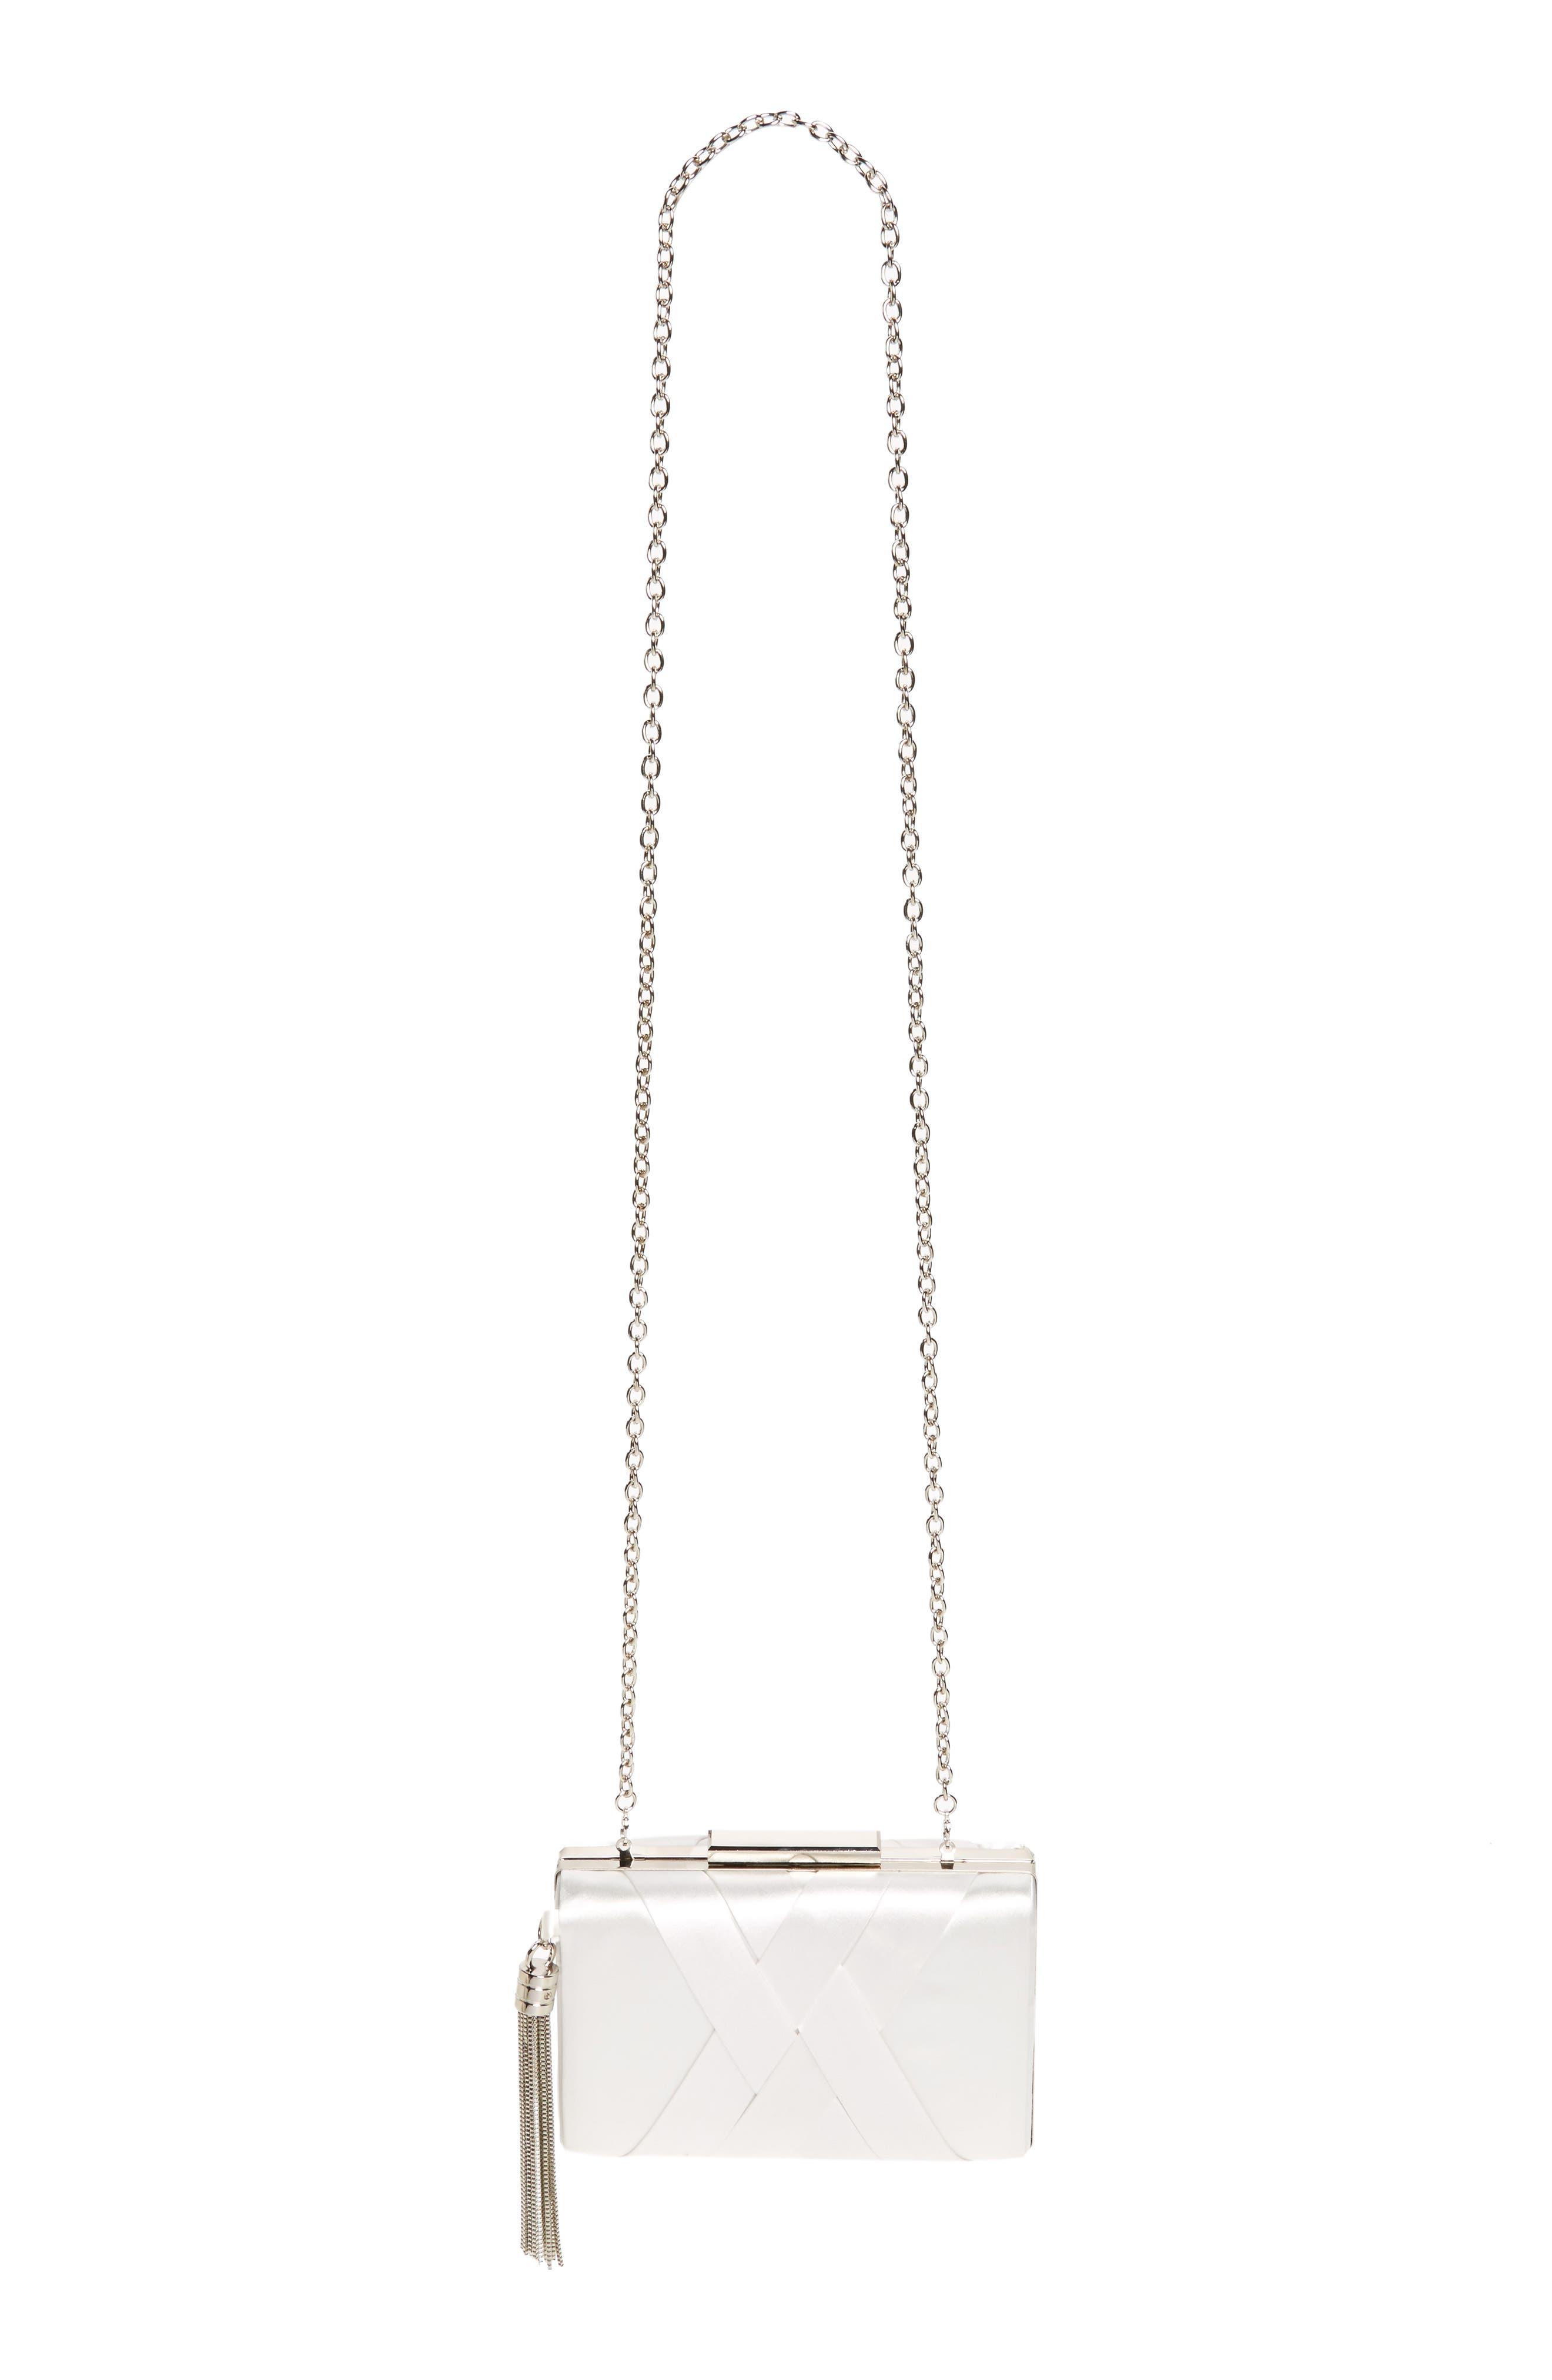 Alternate Image 1 Selected - Sondra Roberts Chain Tassel Woven Satin Box Clutch